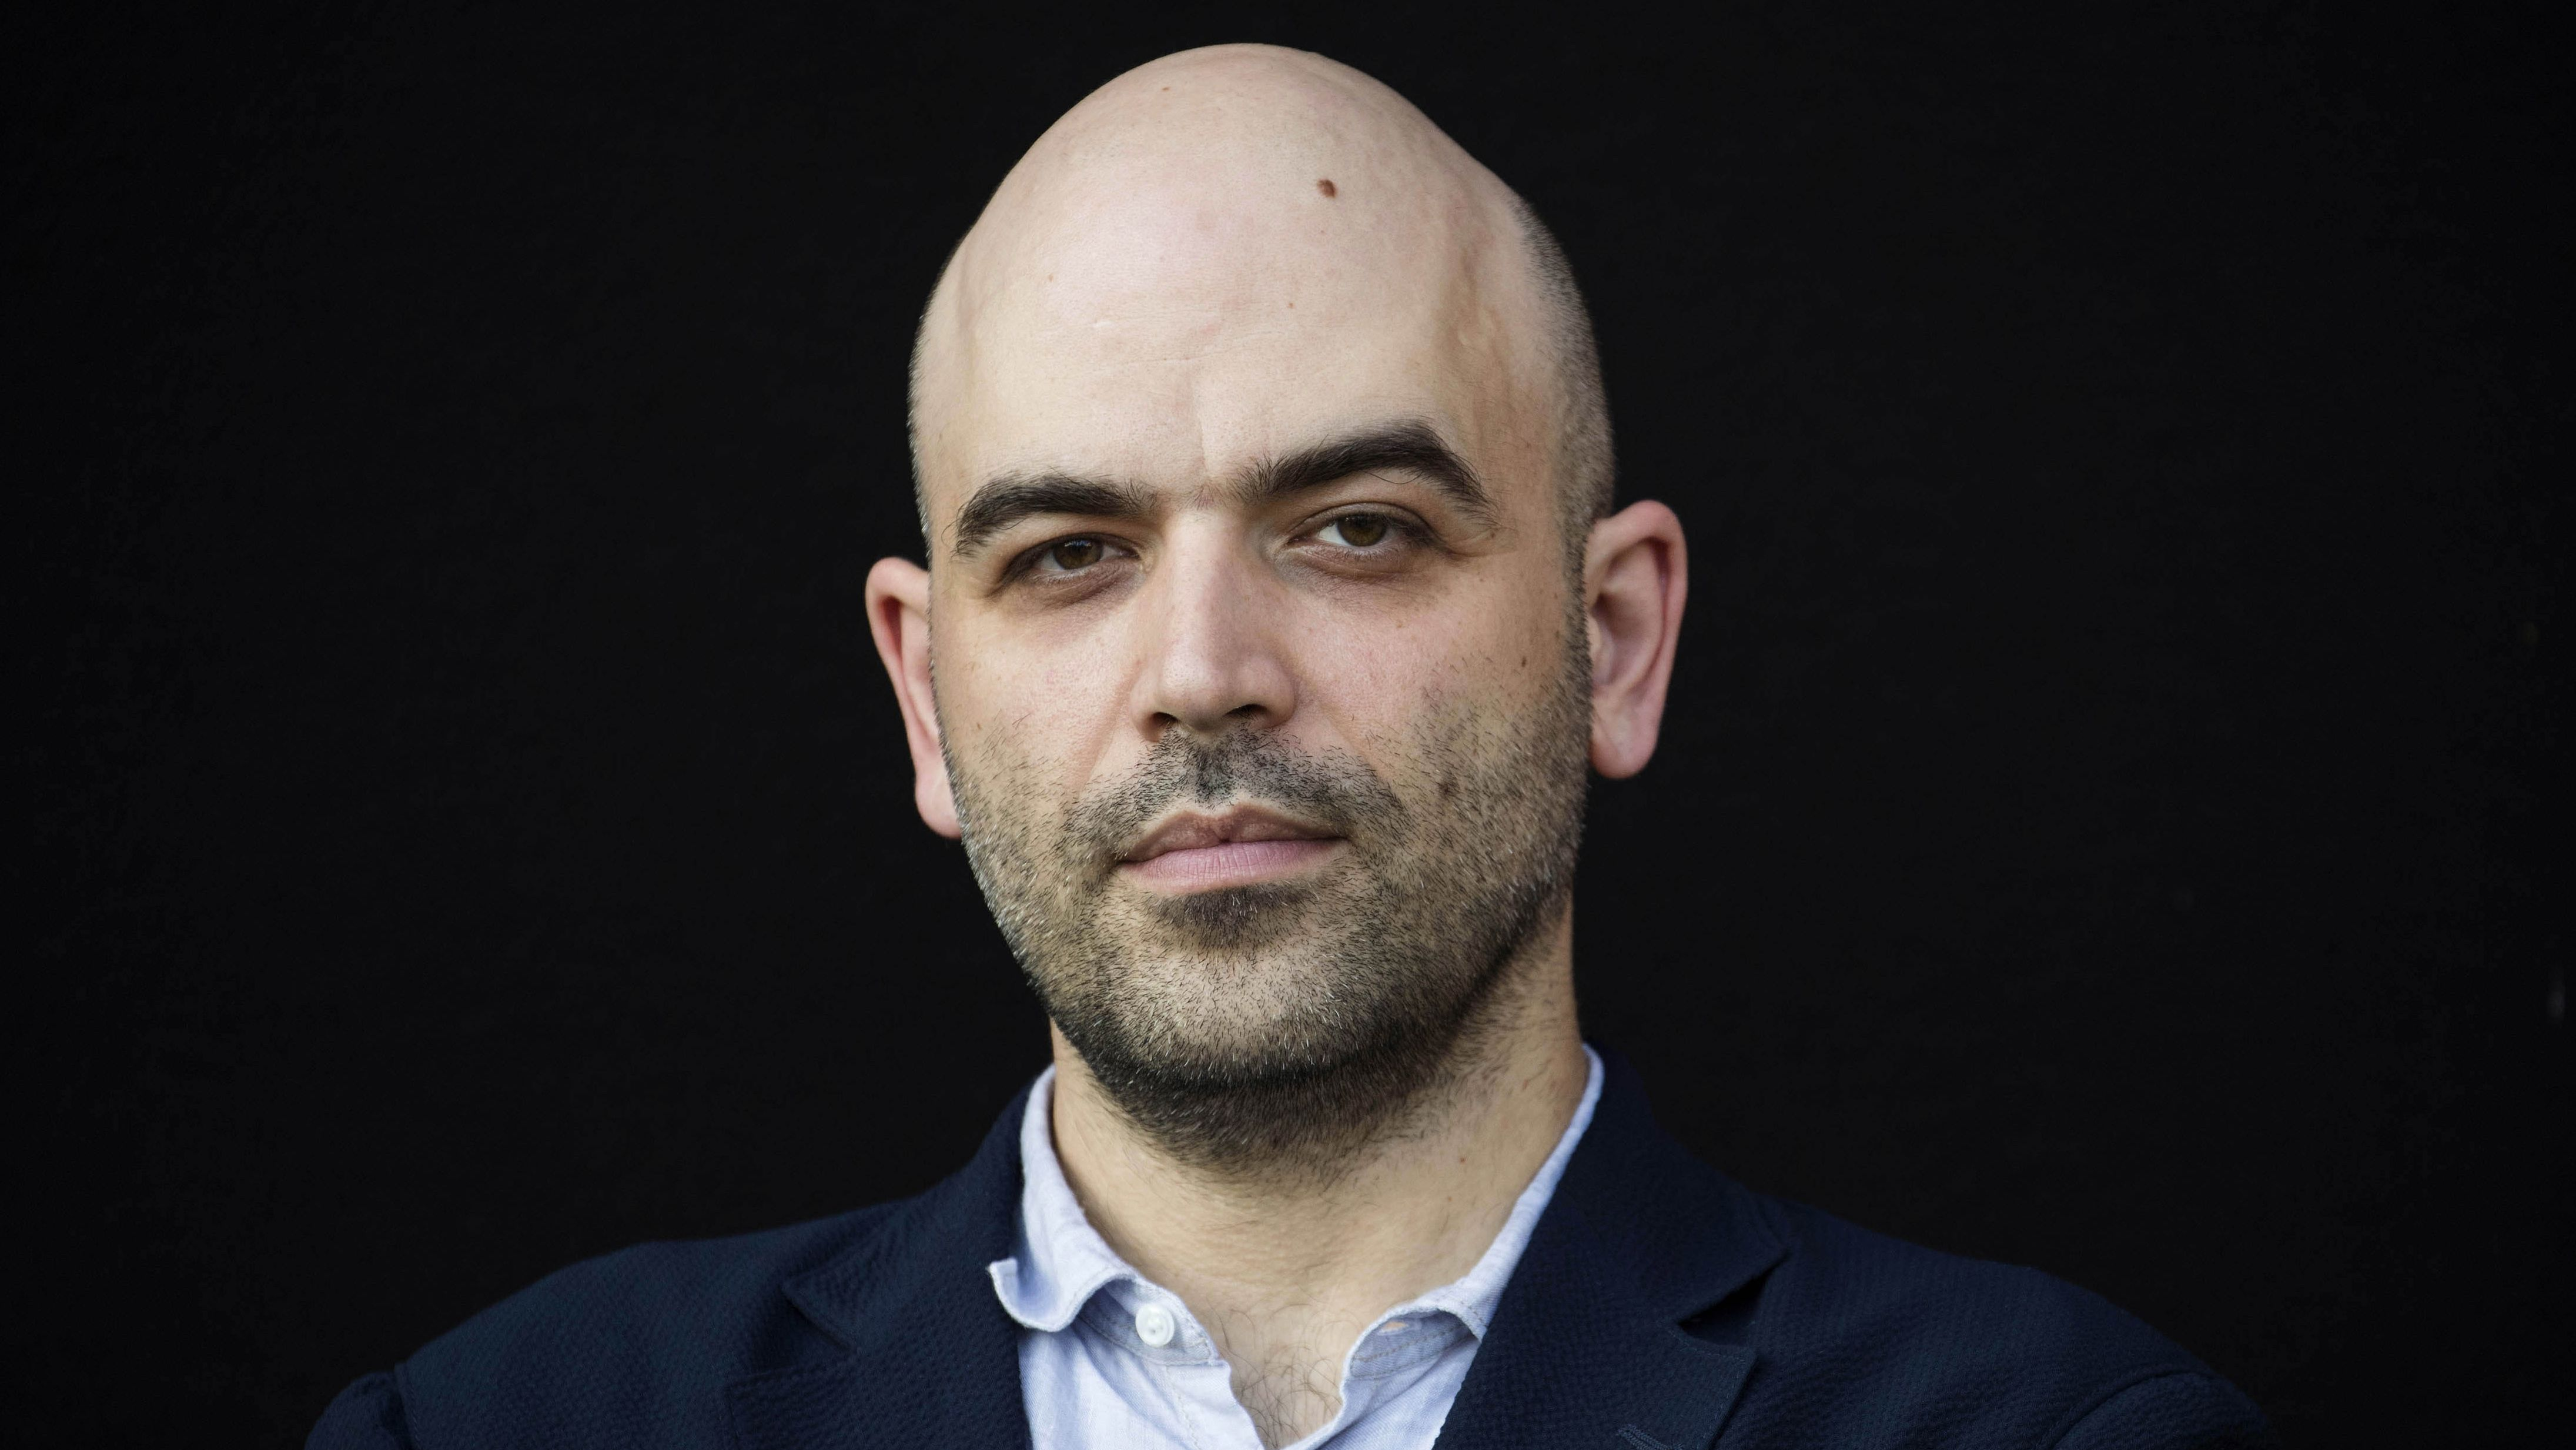 Autor Roberto Saviano im Porträt